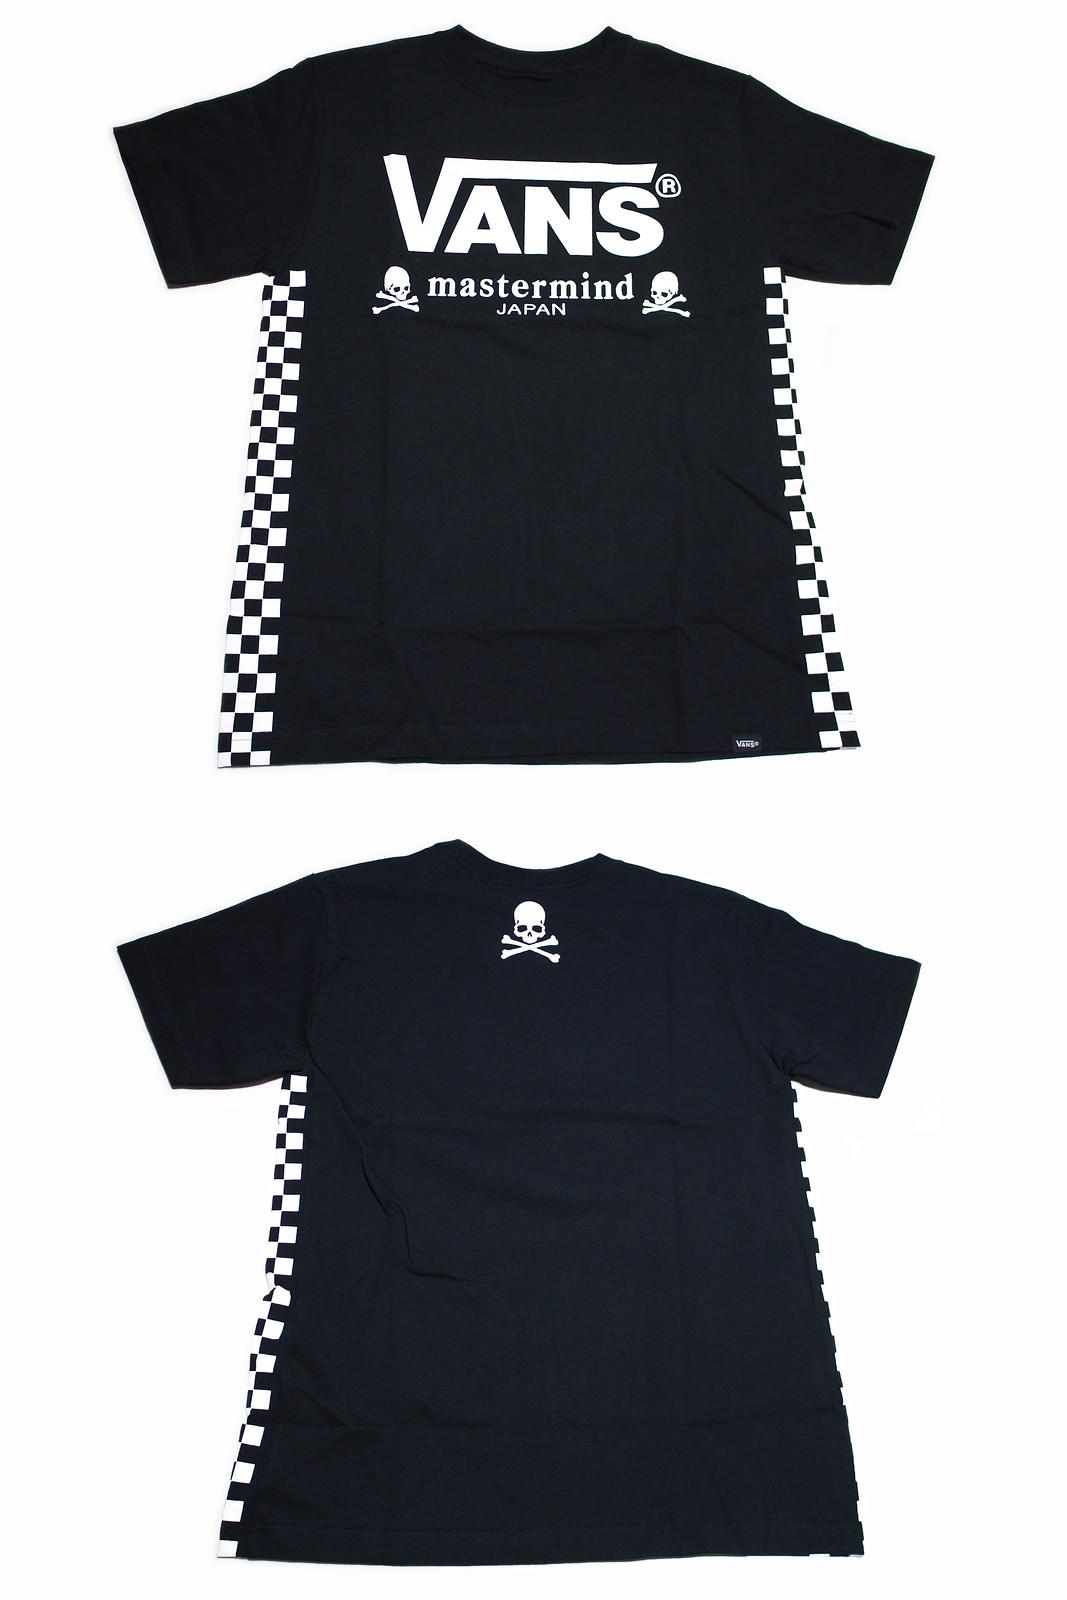 VANS × mastermind JAPAN | SIDE CHECKER S/S T-Shirts